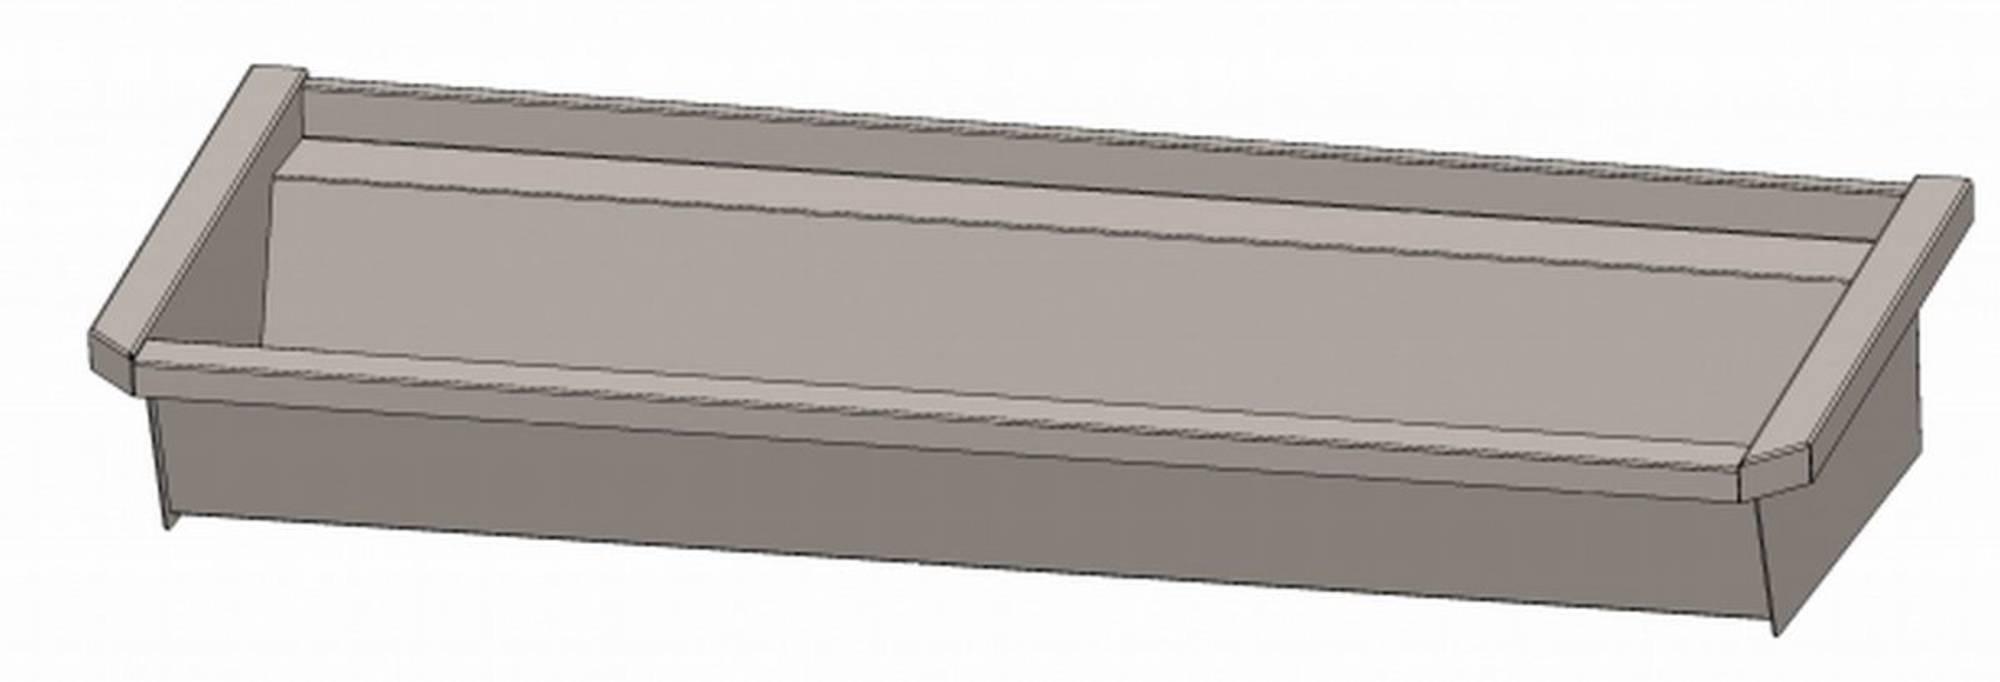 INTERSAN SANILAV wasgoot 120 cm. zonder leidingen zonder kranen INOX 304 (502Z1)